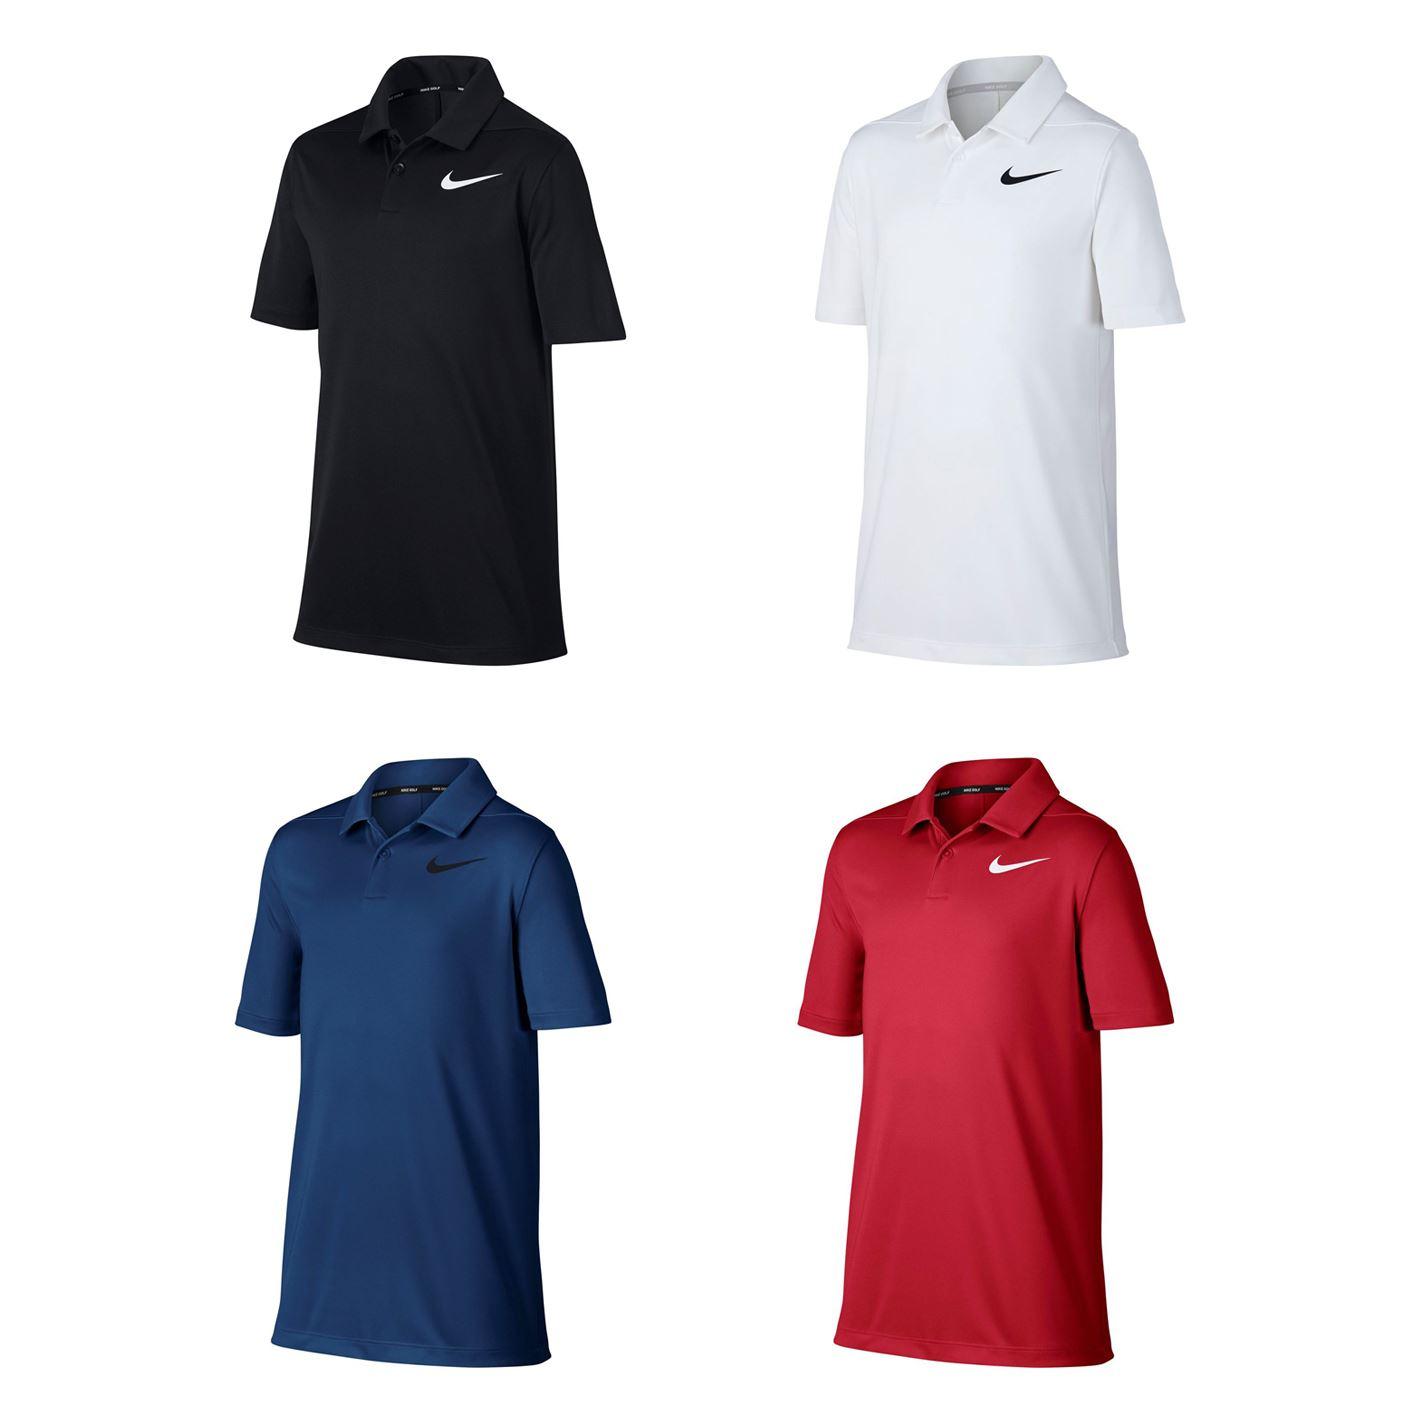 527b0f46 ... Nike Victory Polo Shirt Junior Boys Tops T-Shirt Outerwear ...